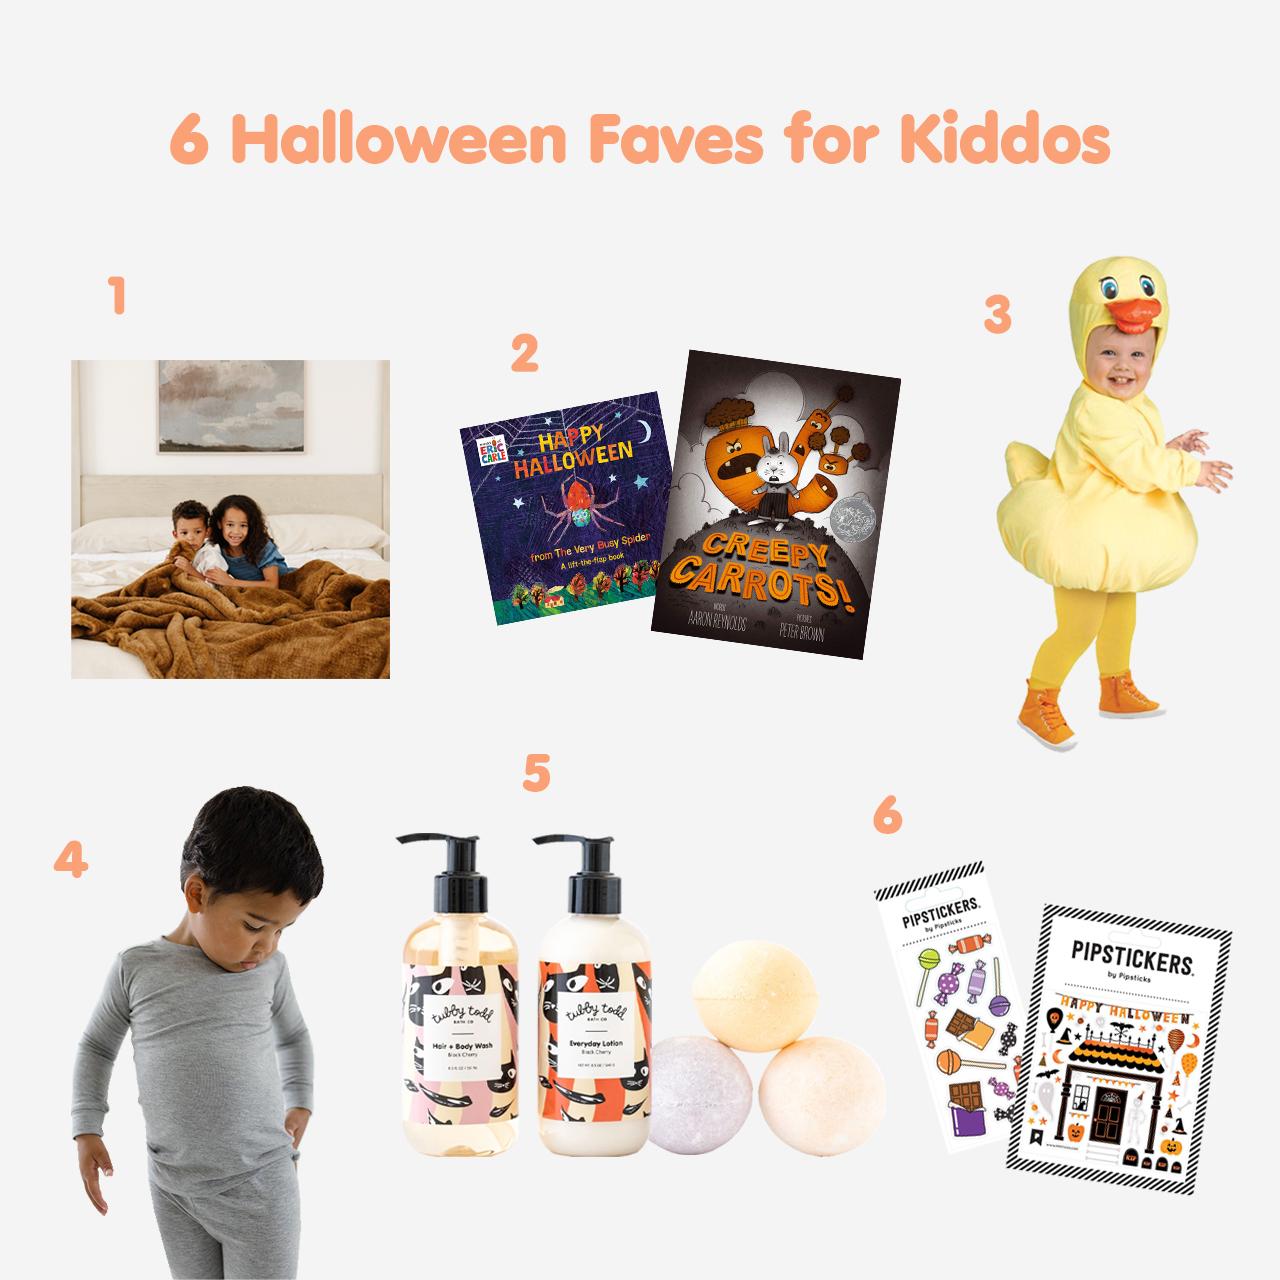 Halloween Favorites for Kiddos